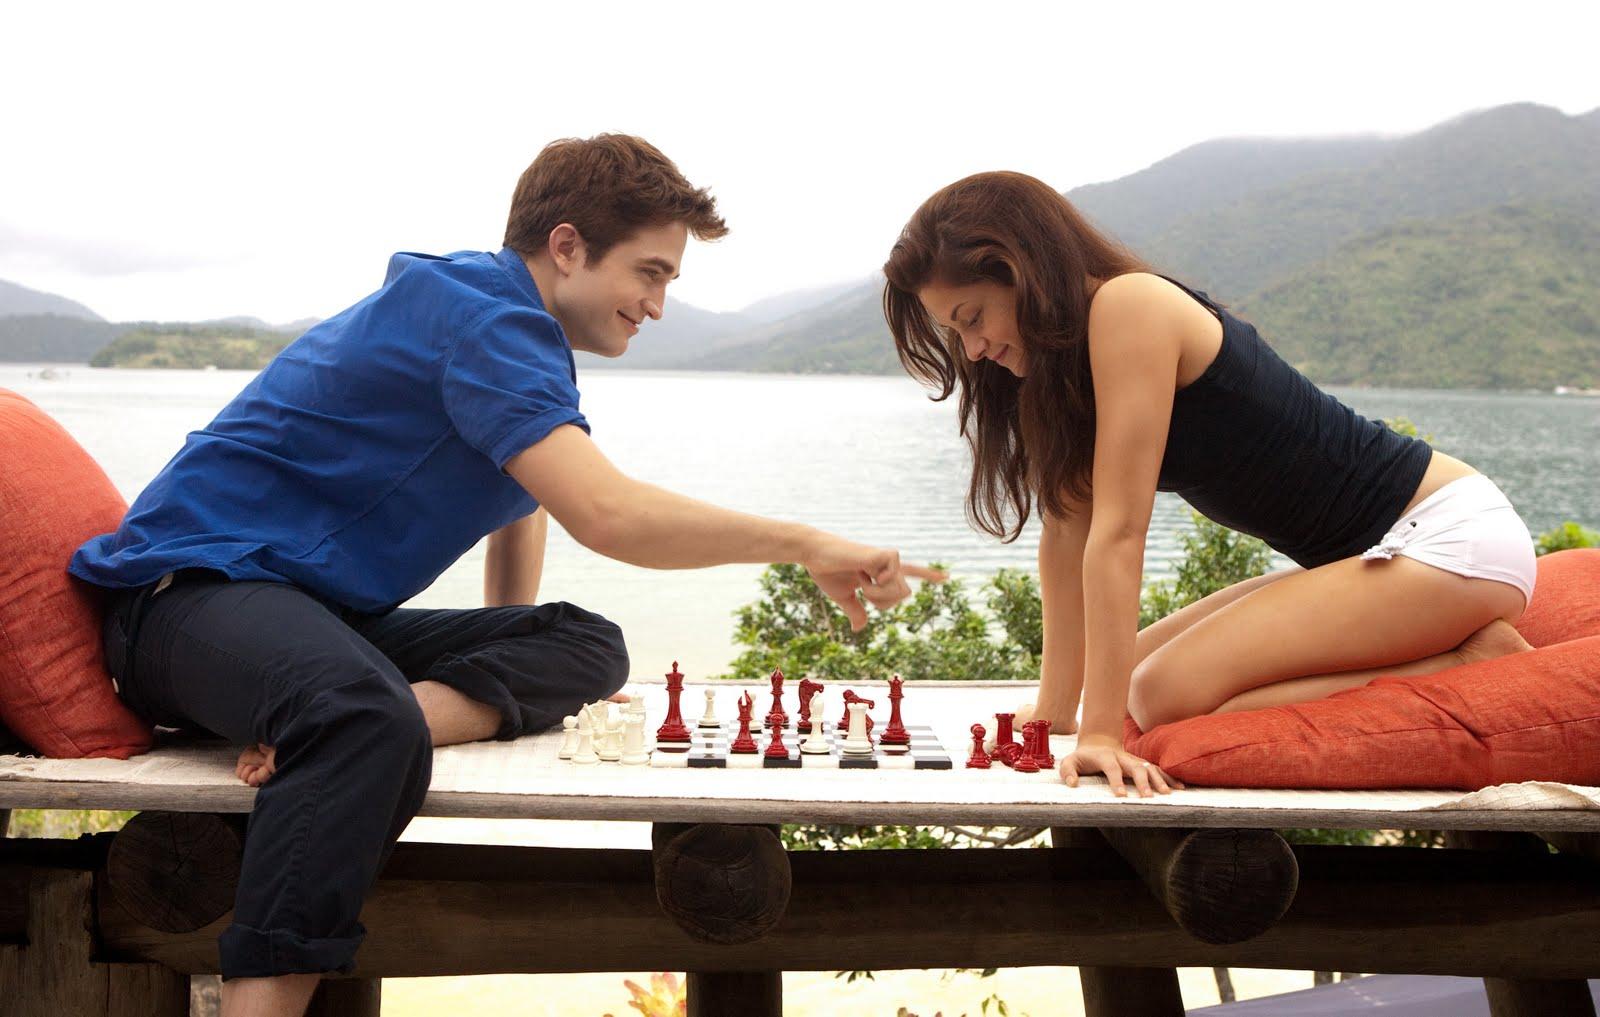 Honeymoon_playing_chess - Romantic Checkmate - Love Talk